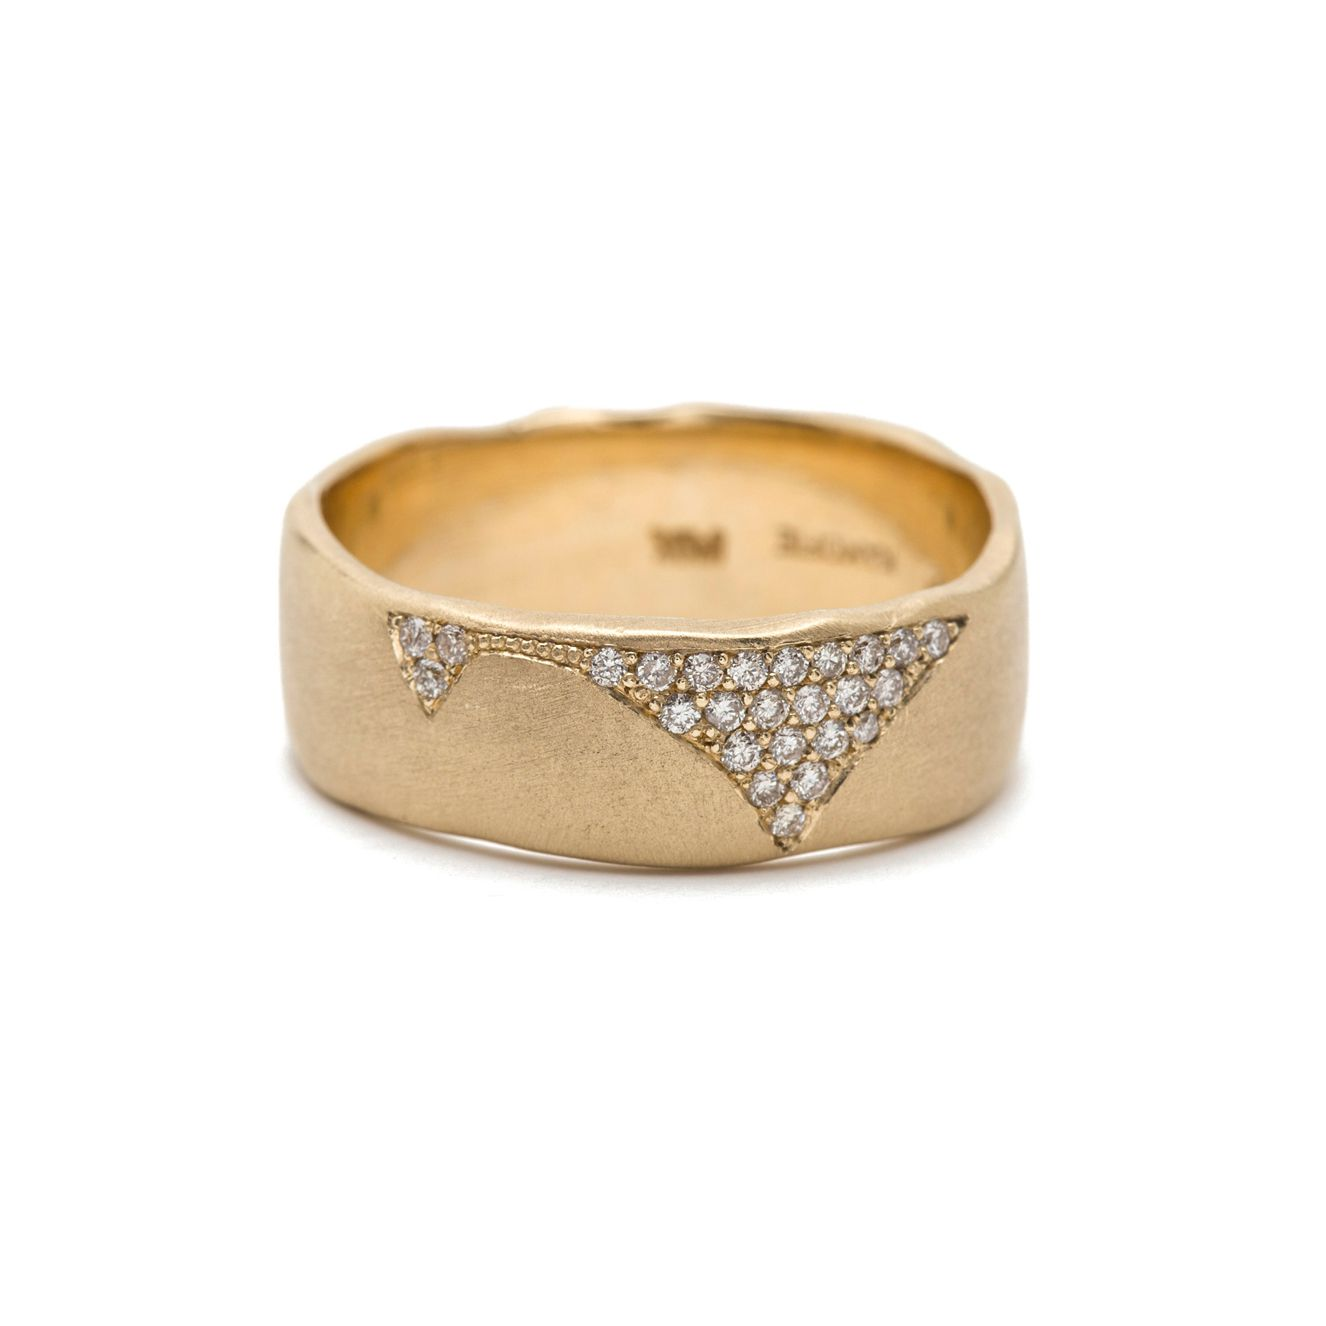 Sofia Kaman Yellow Gold Cracked Band With Pavé Set Diamonds